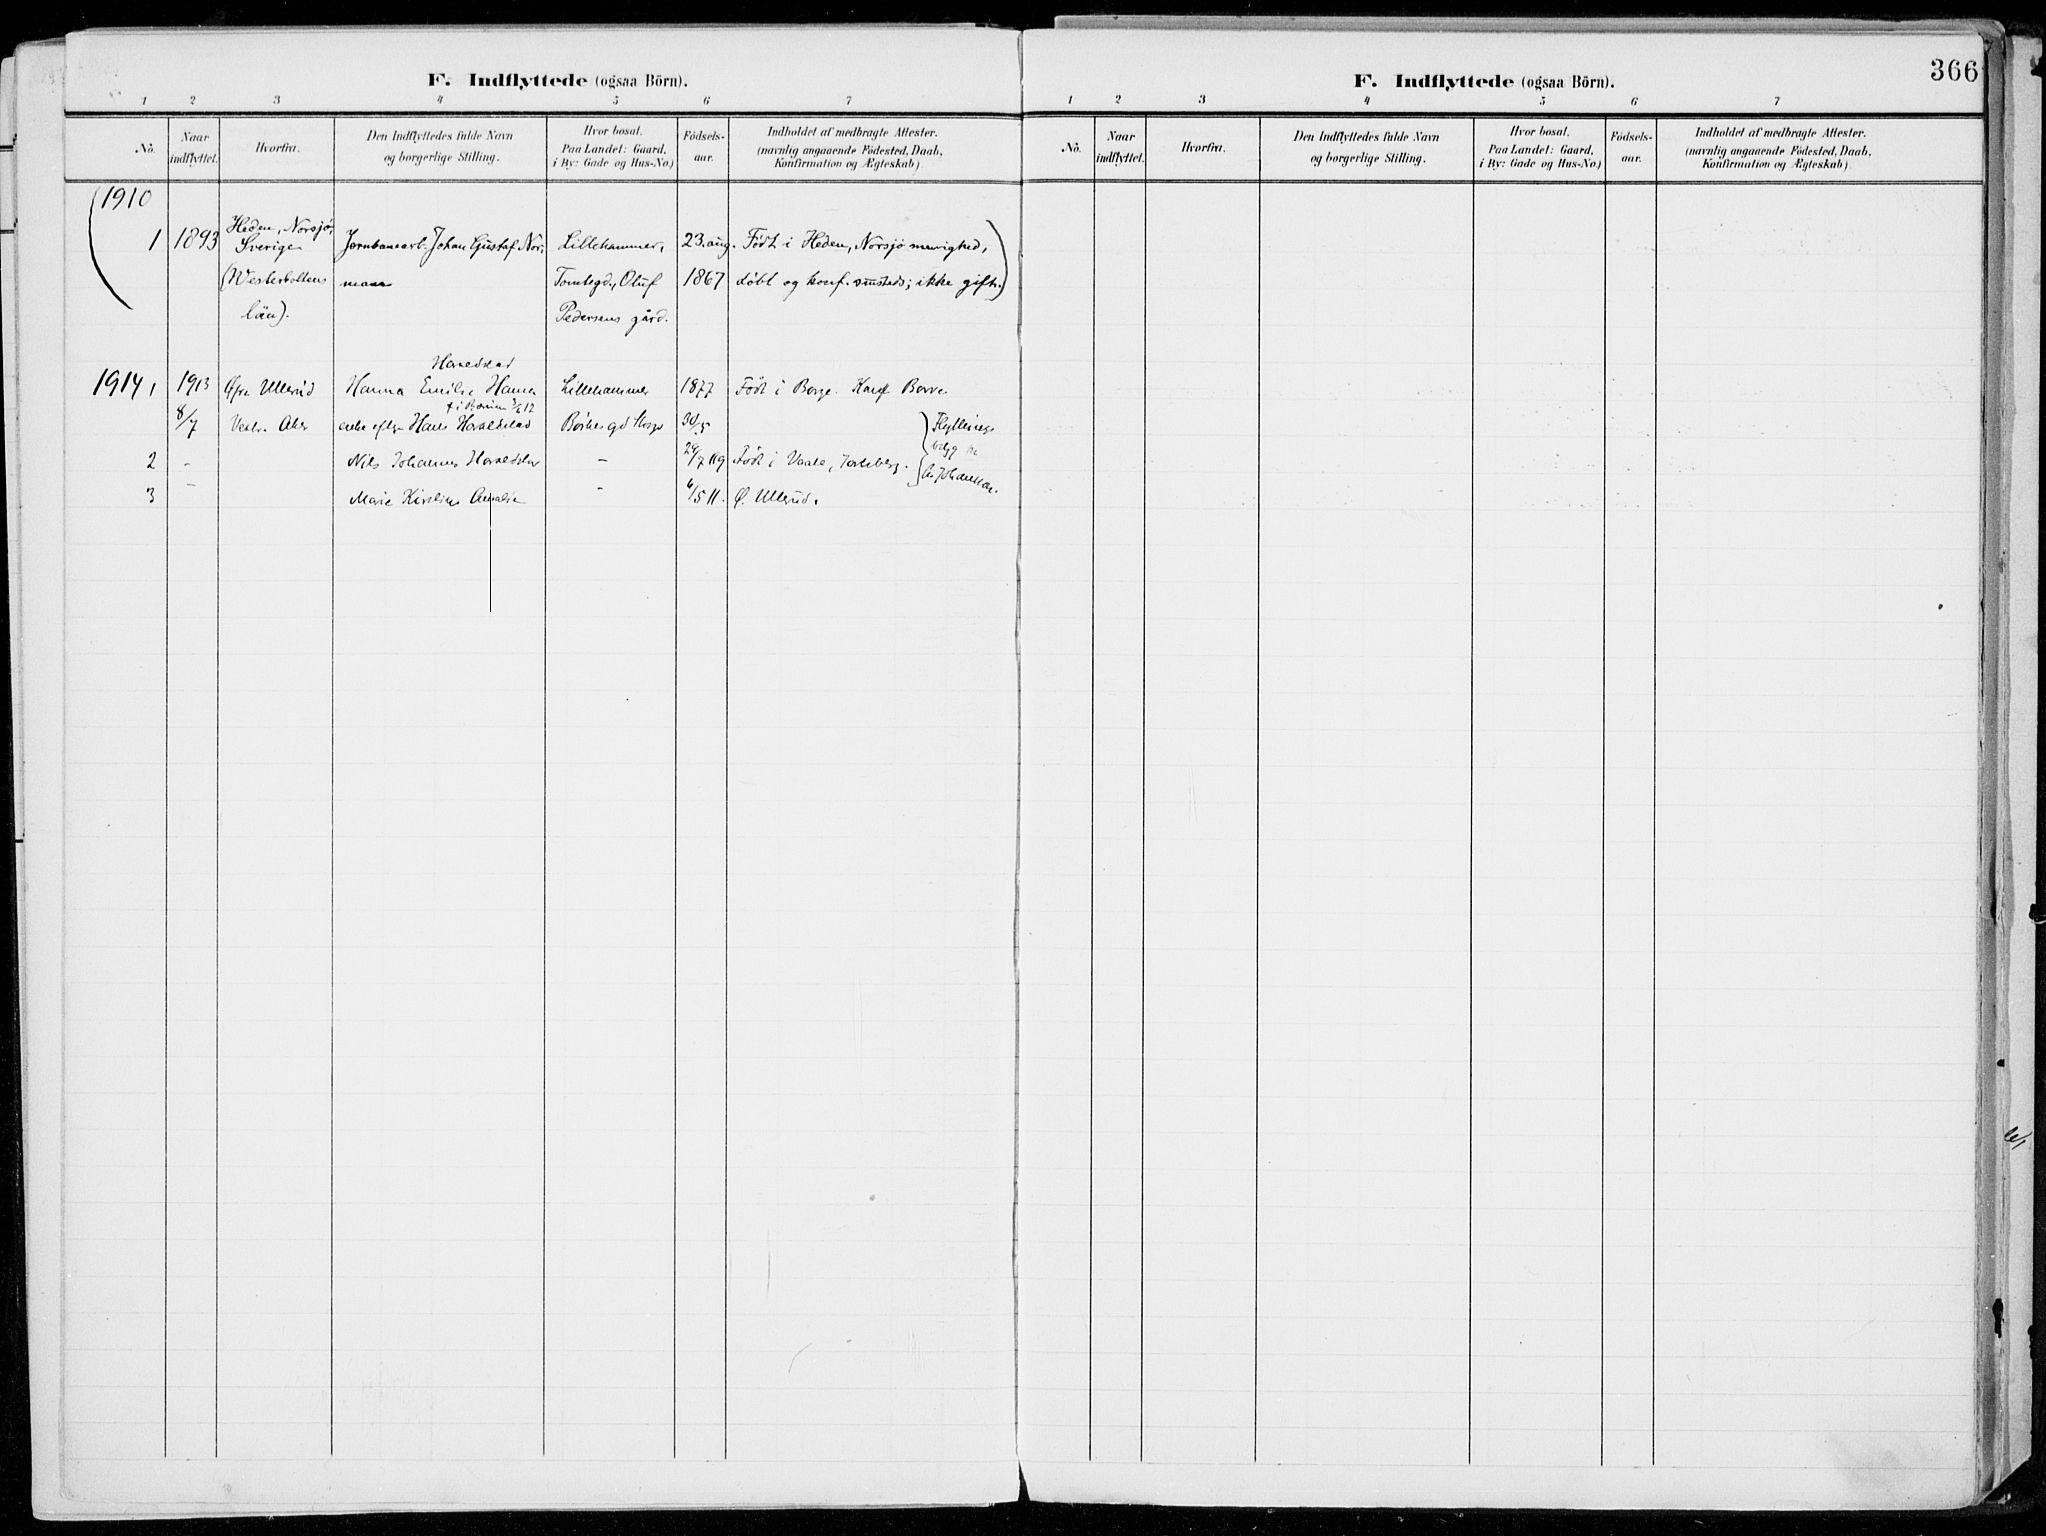 SAH, Lillehammer prestekontor, Ministerialbok nr. 1, 1901-1916, s. 366